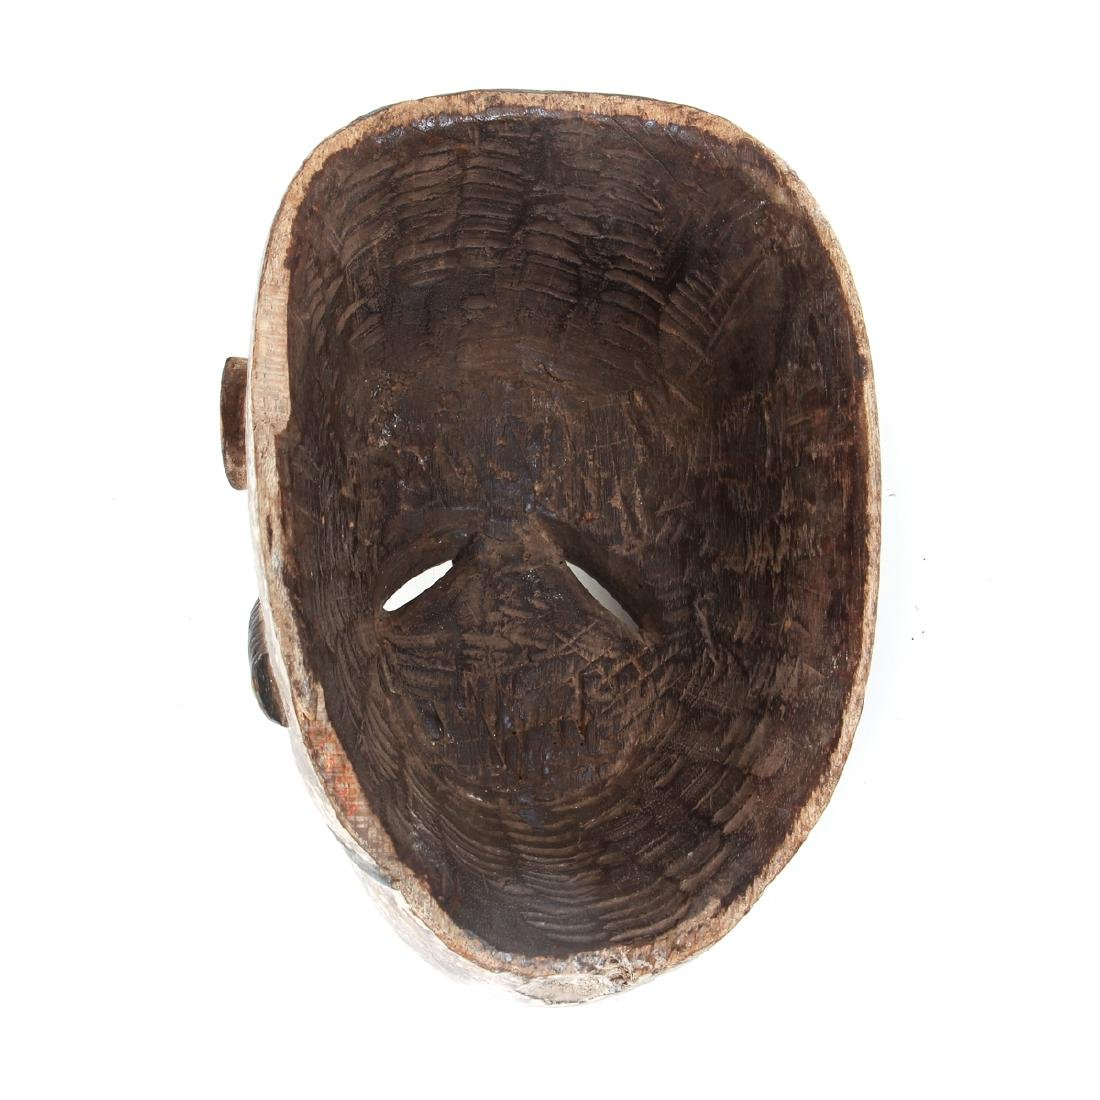 Southern Idoma or Igbo Peoples Mask - 2